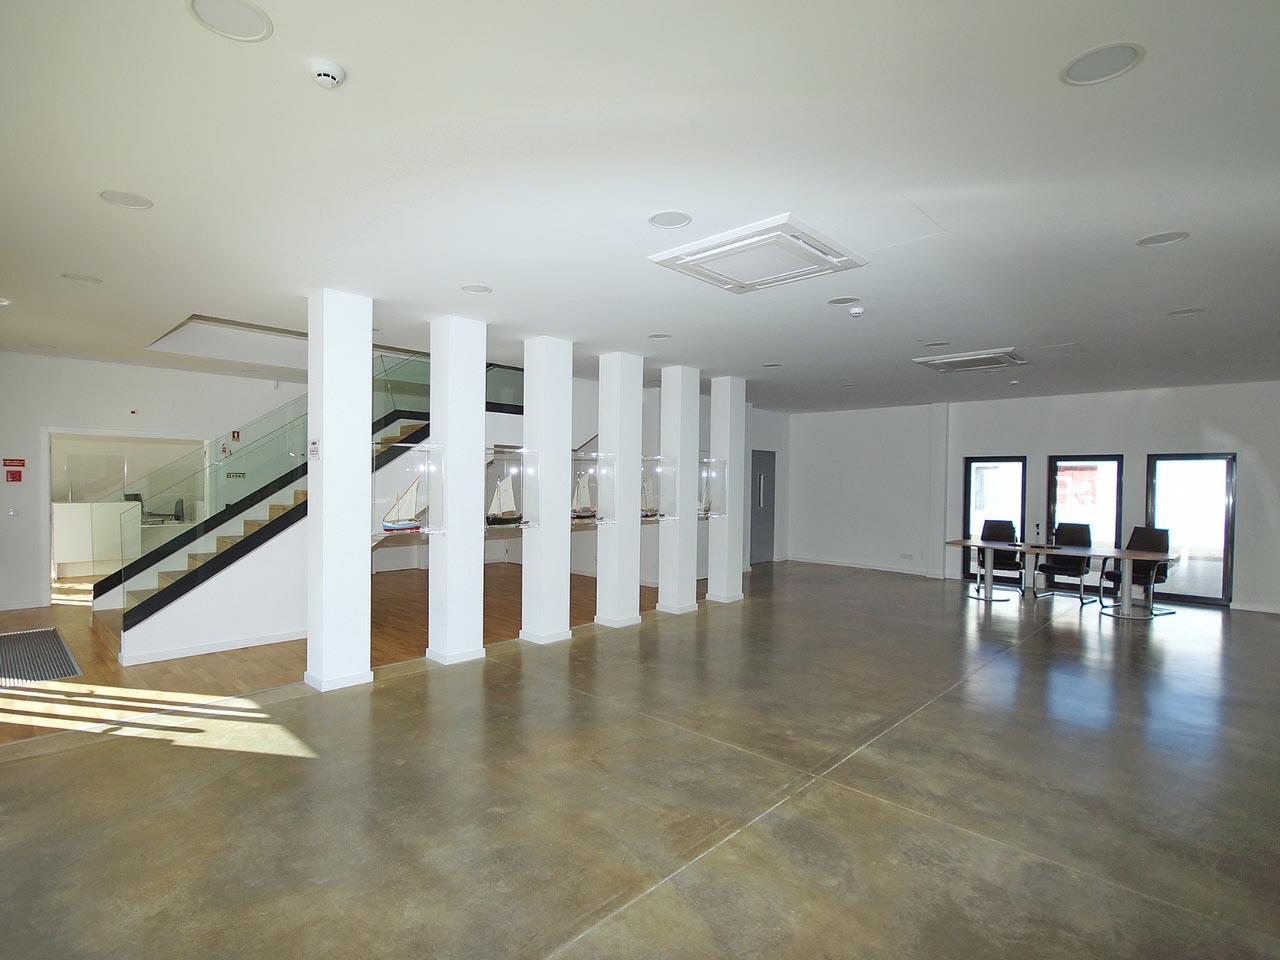 https://www.araujo-arquitectura.pt/wp-content/uploads/2021/01/04.jpg